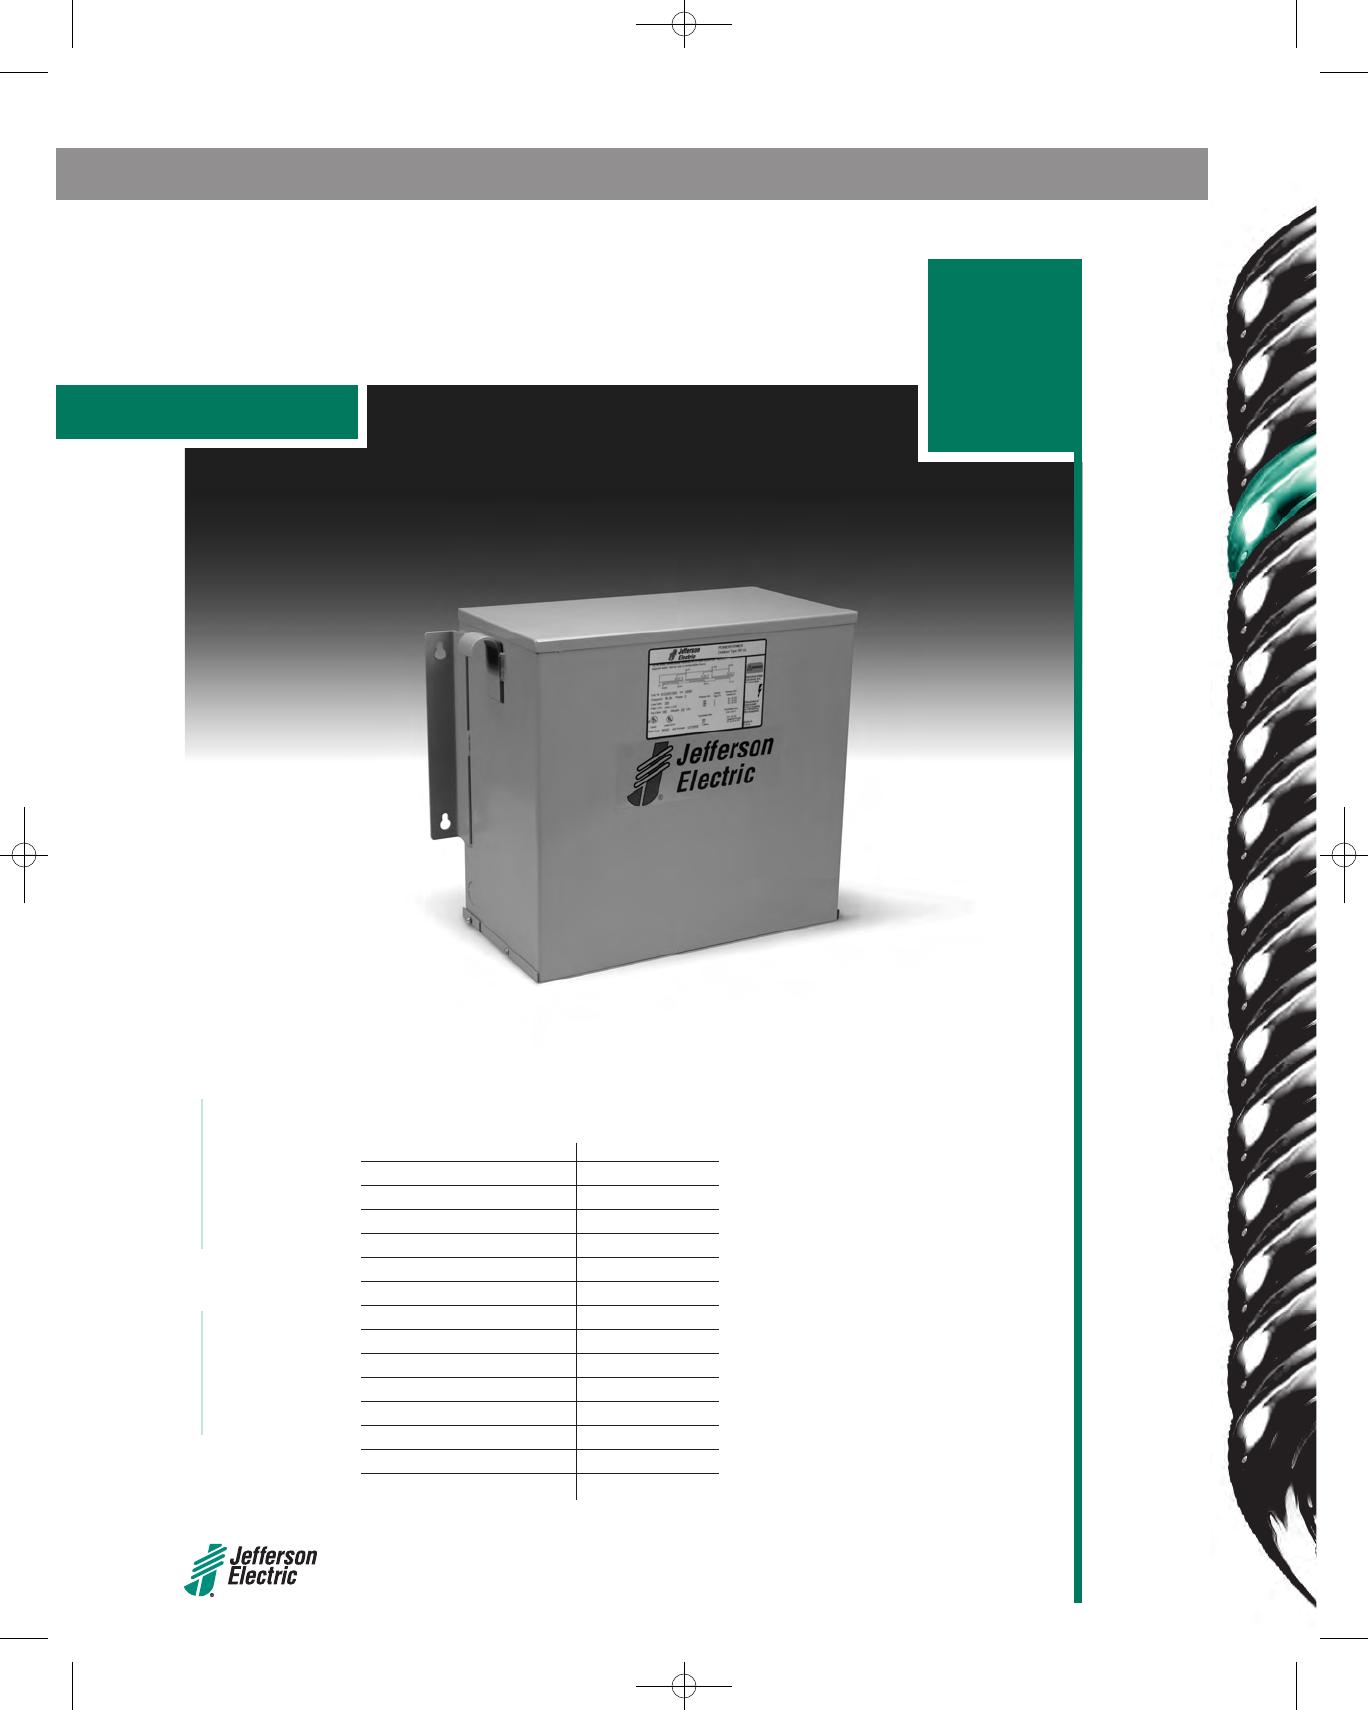 Siemens Dry Type Transformer Installation Manual Wiring Diagram